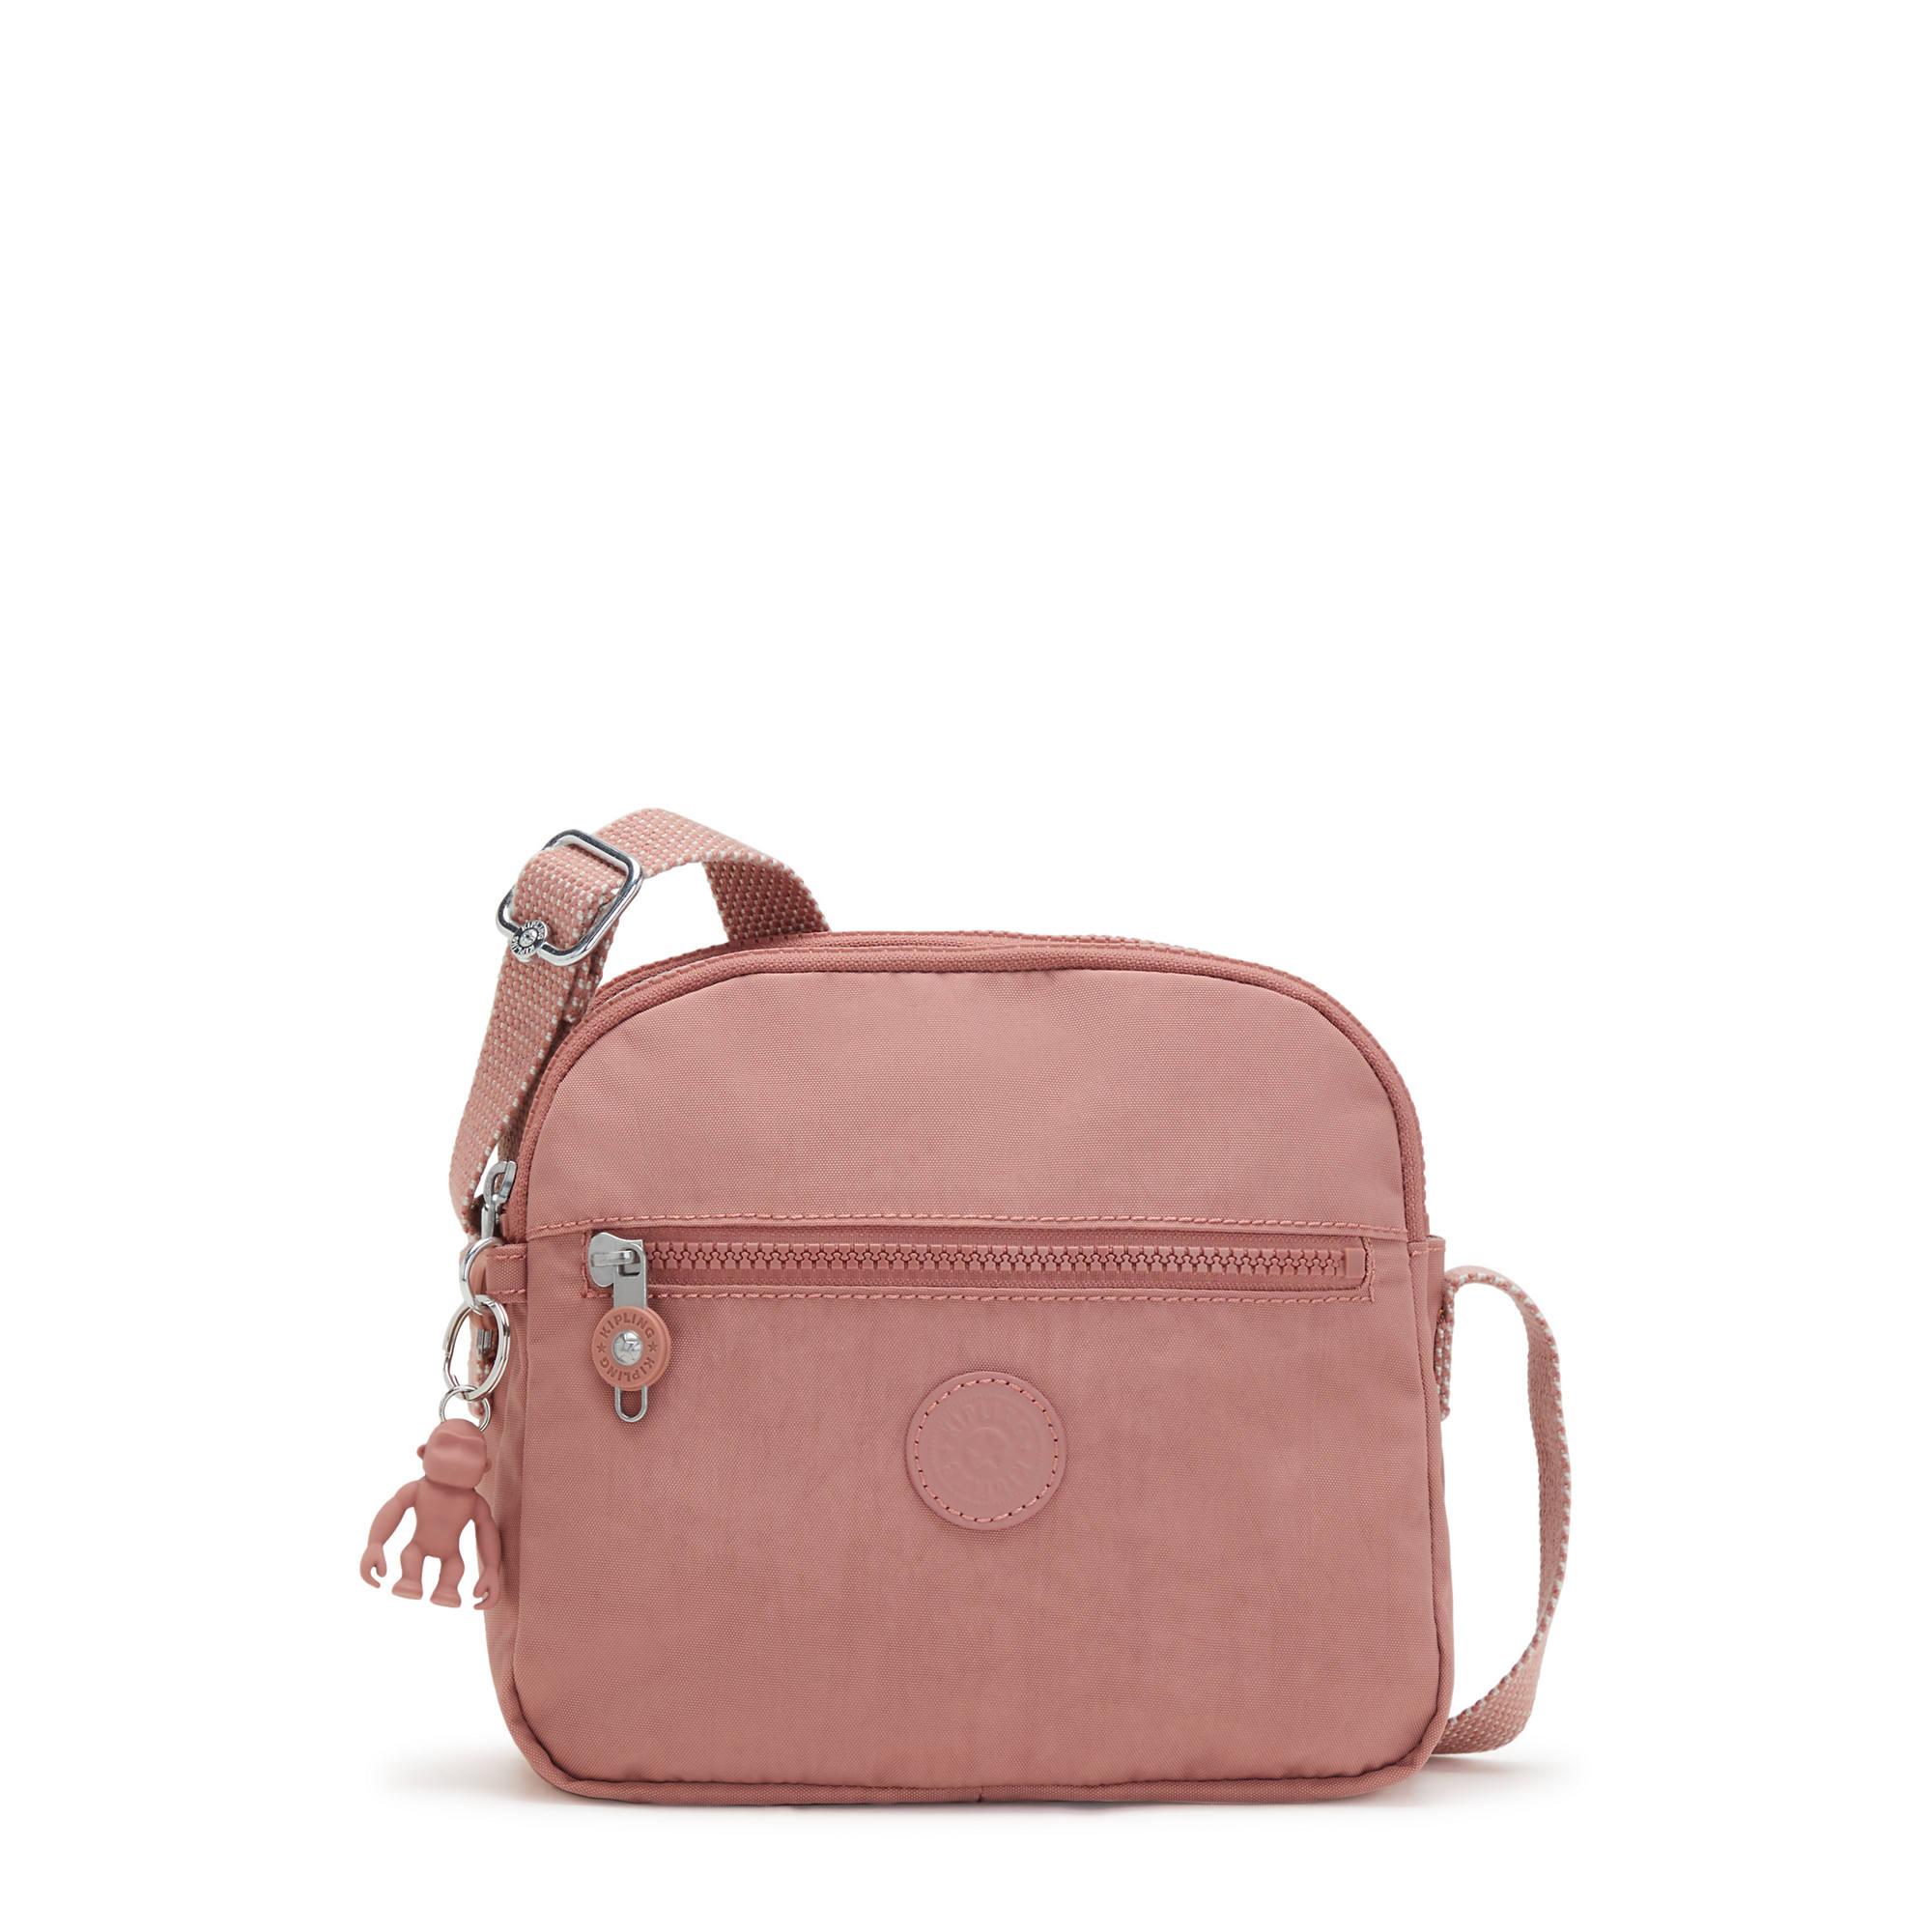 Keefe Crossbody Bag Kipling Click Image For Larger Versionnamewiringeecivrelayjpgviews6987size Bagstrawberry Pinklarge